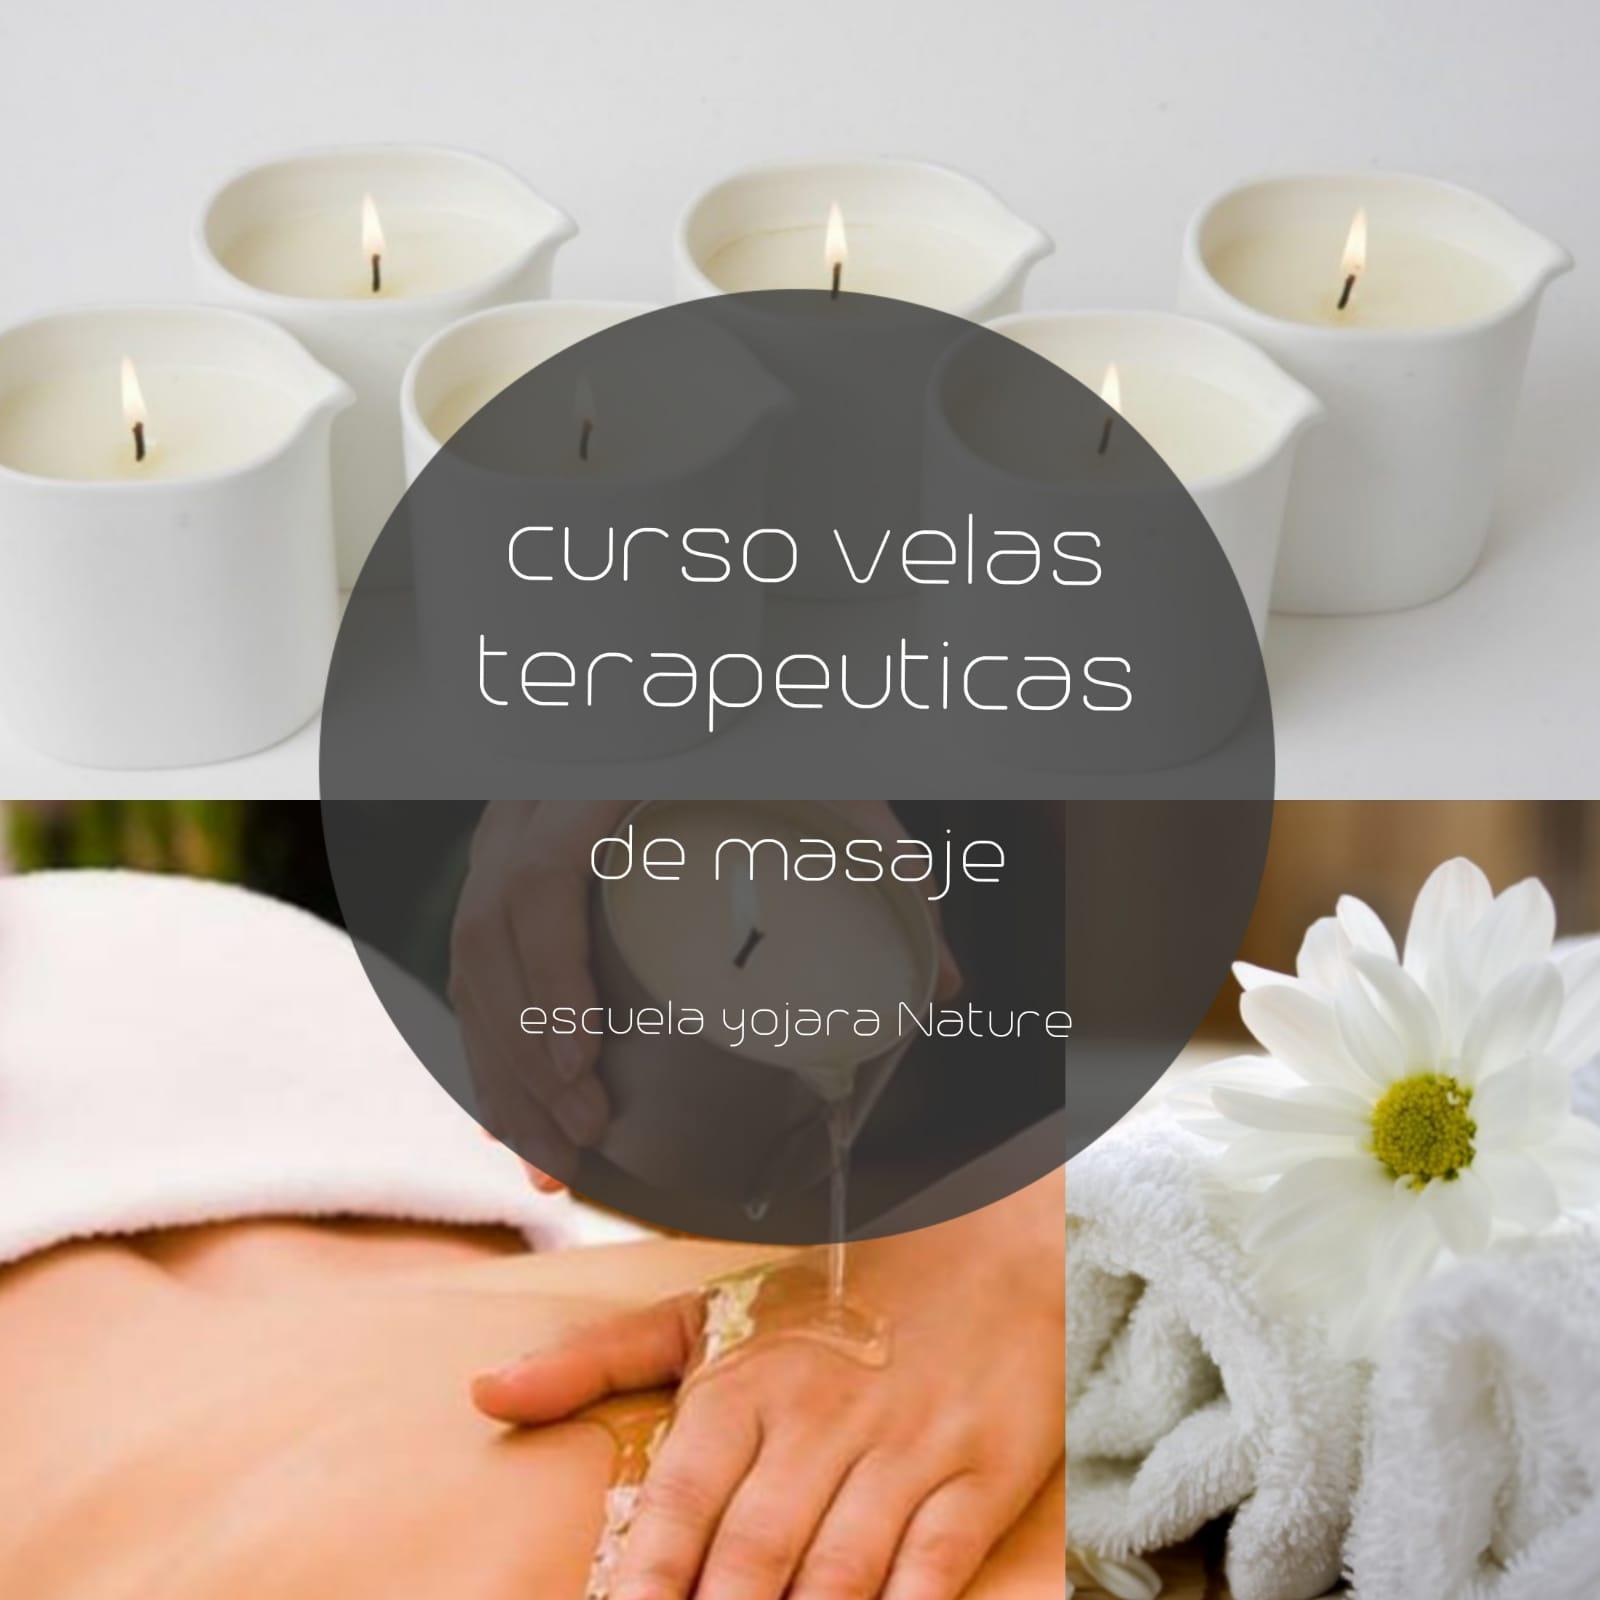 curso cosmetica natural, curso velas terapeuticas de masaje